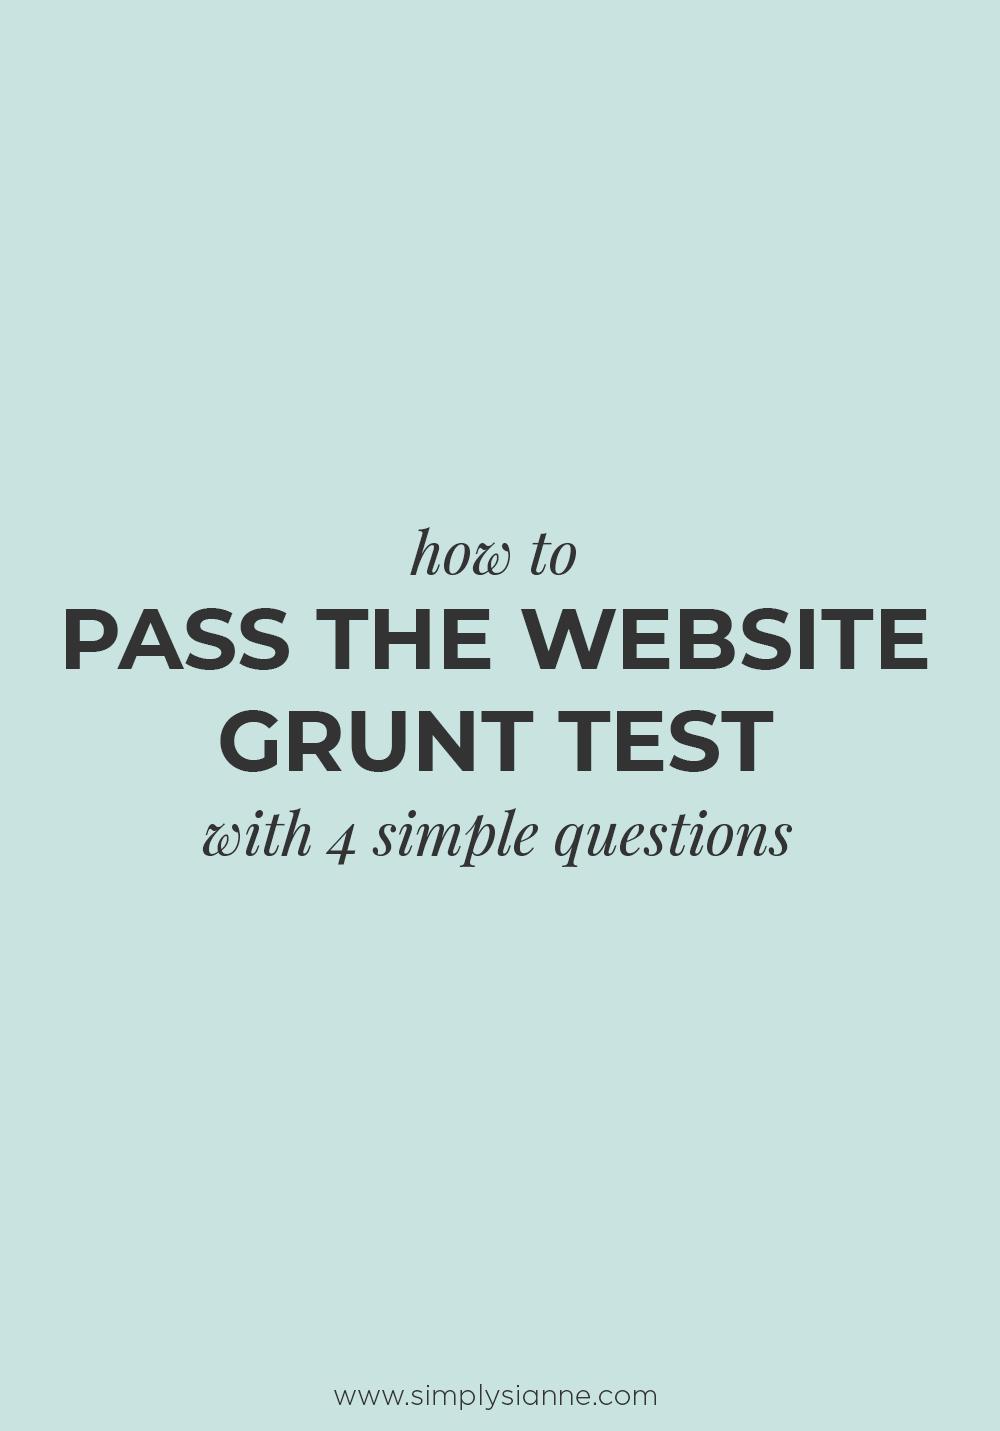 d69b9d2f9d7f2728b0170fe4f3cb41f1 - How To Pass The Best Buy Application Test